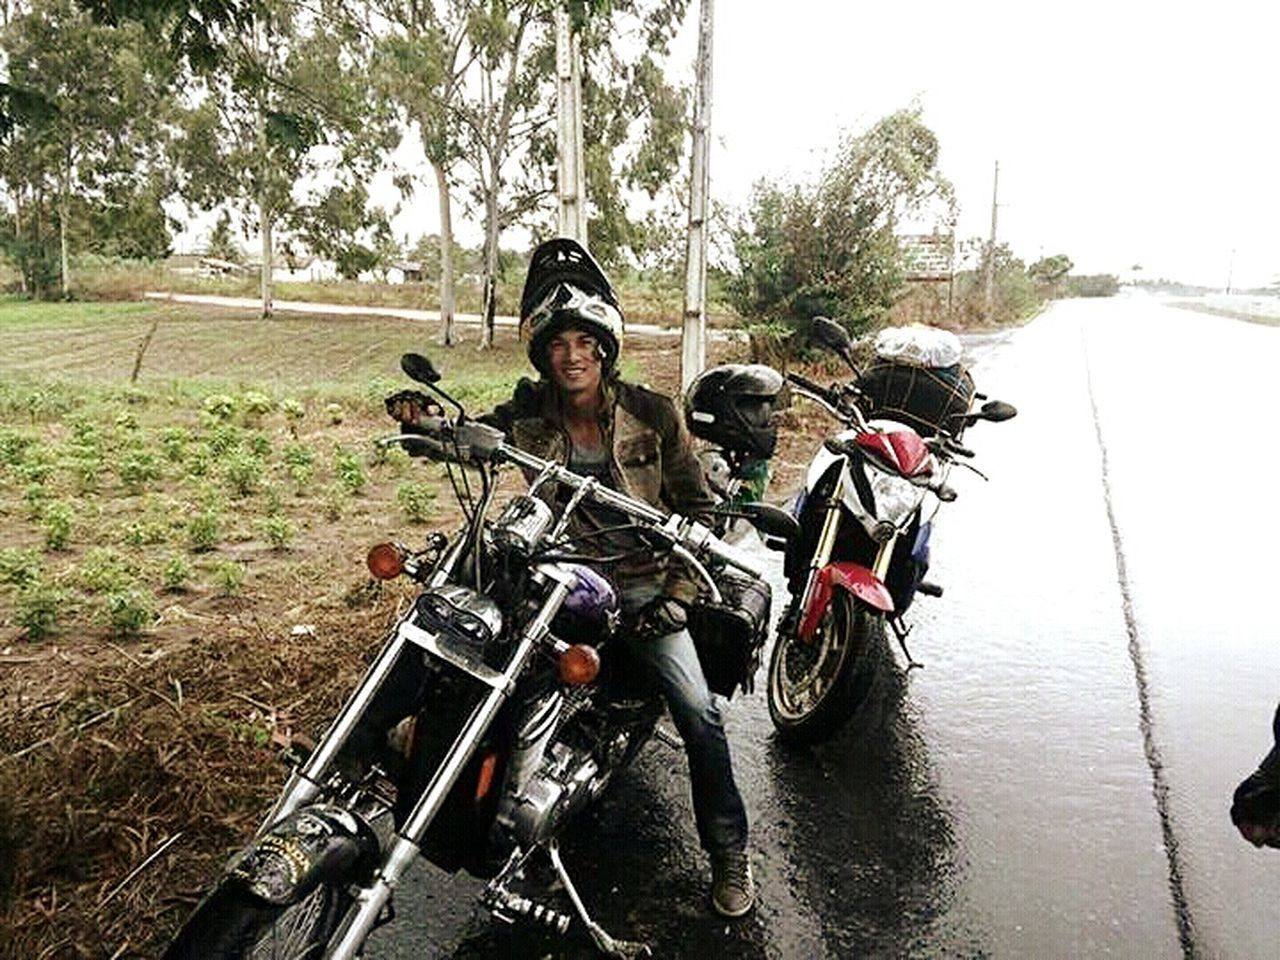 Pegando a estrada. MotoClube Adventure